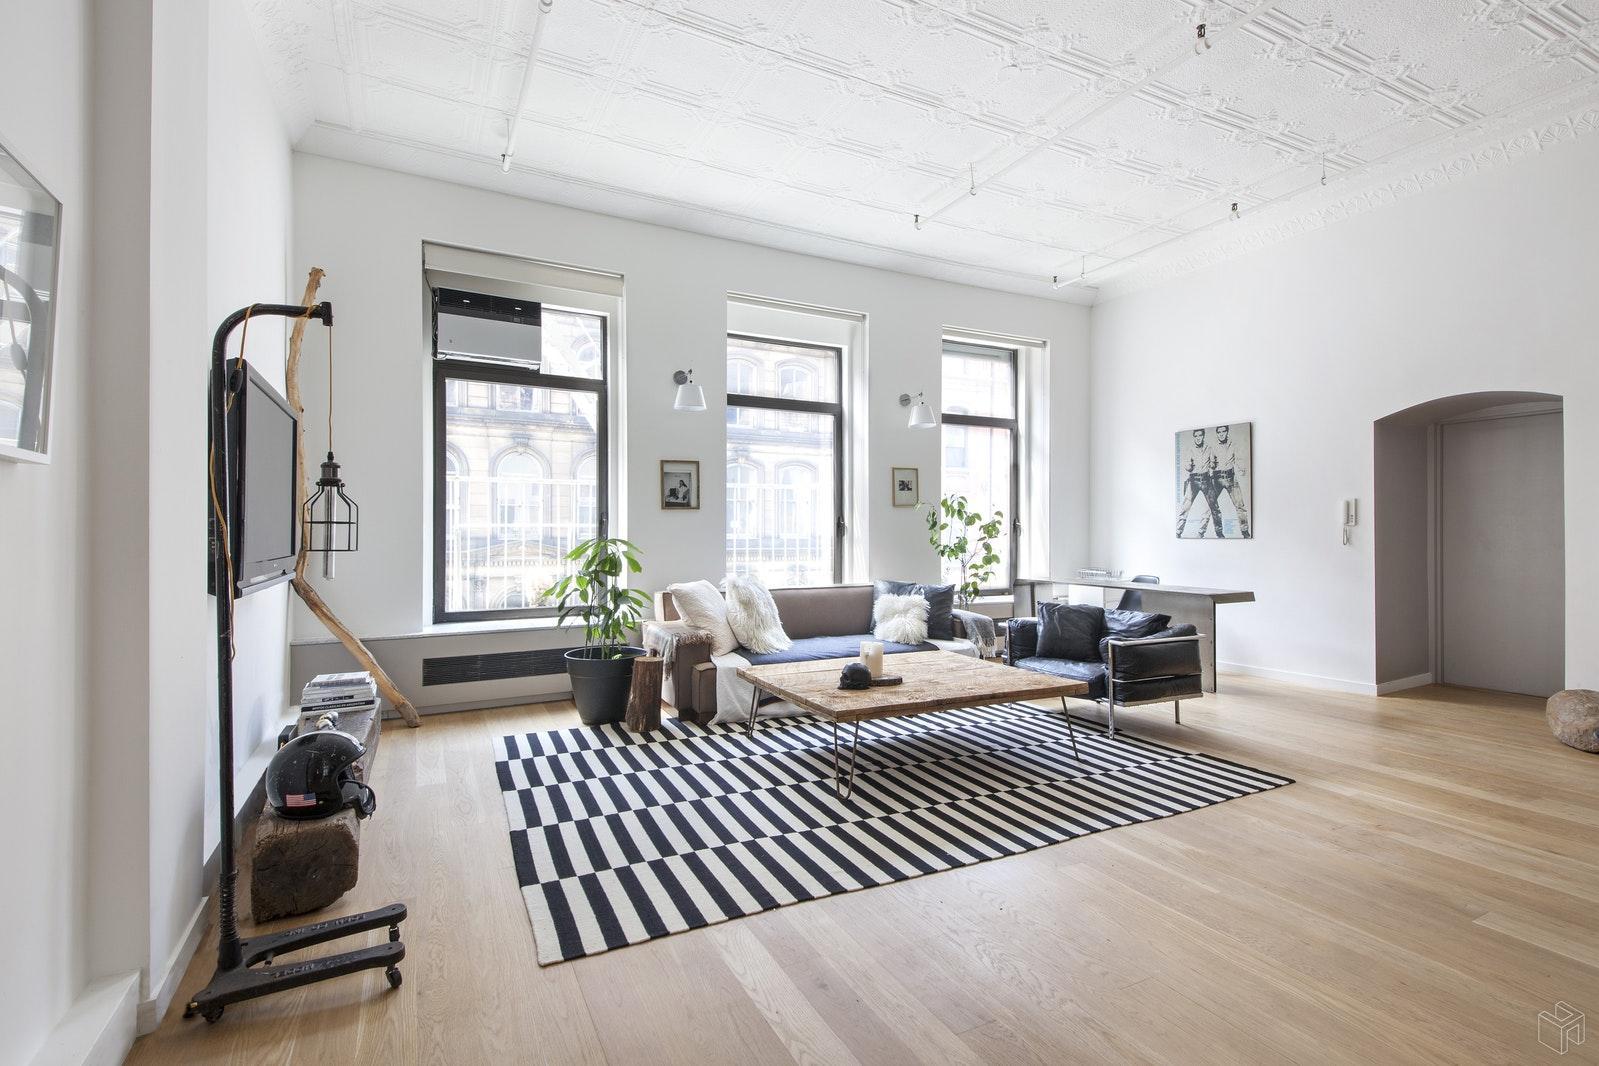 104 READE STREET, Tribeca, $8,950, Web #: 19533379